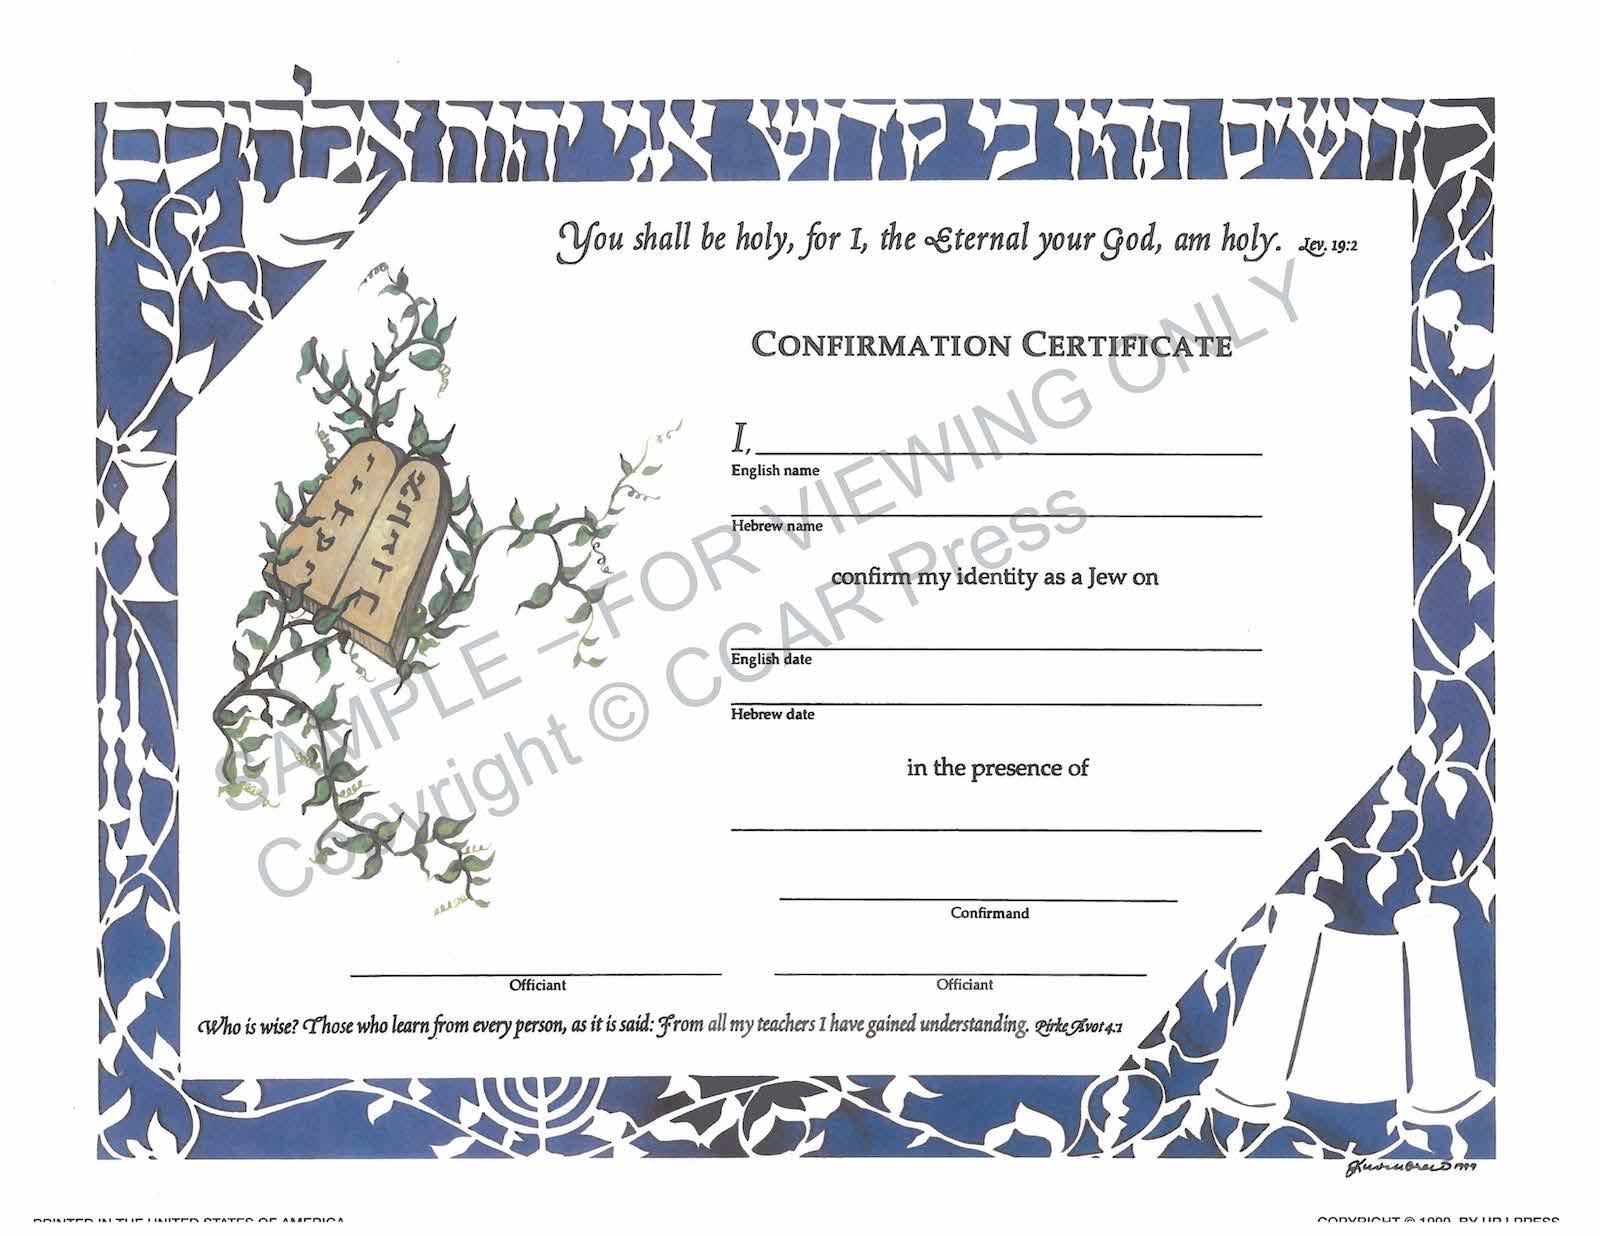 Confirmation, Single, Illuminated - Certificate